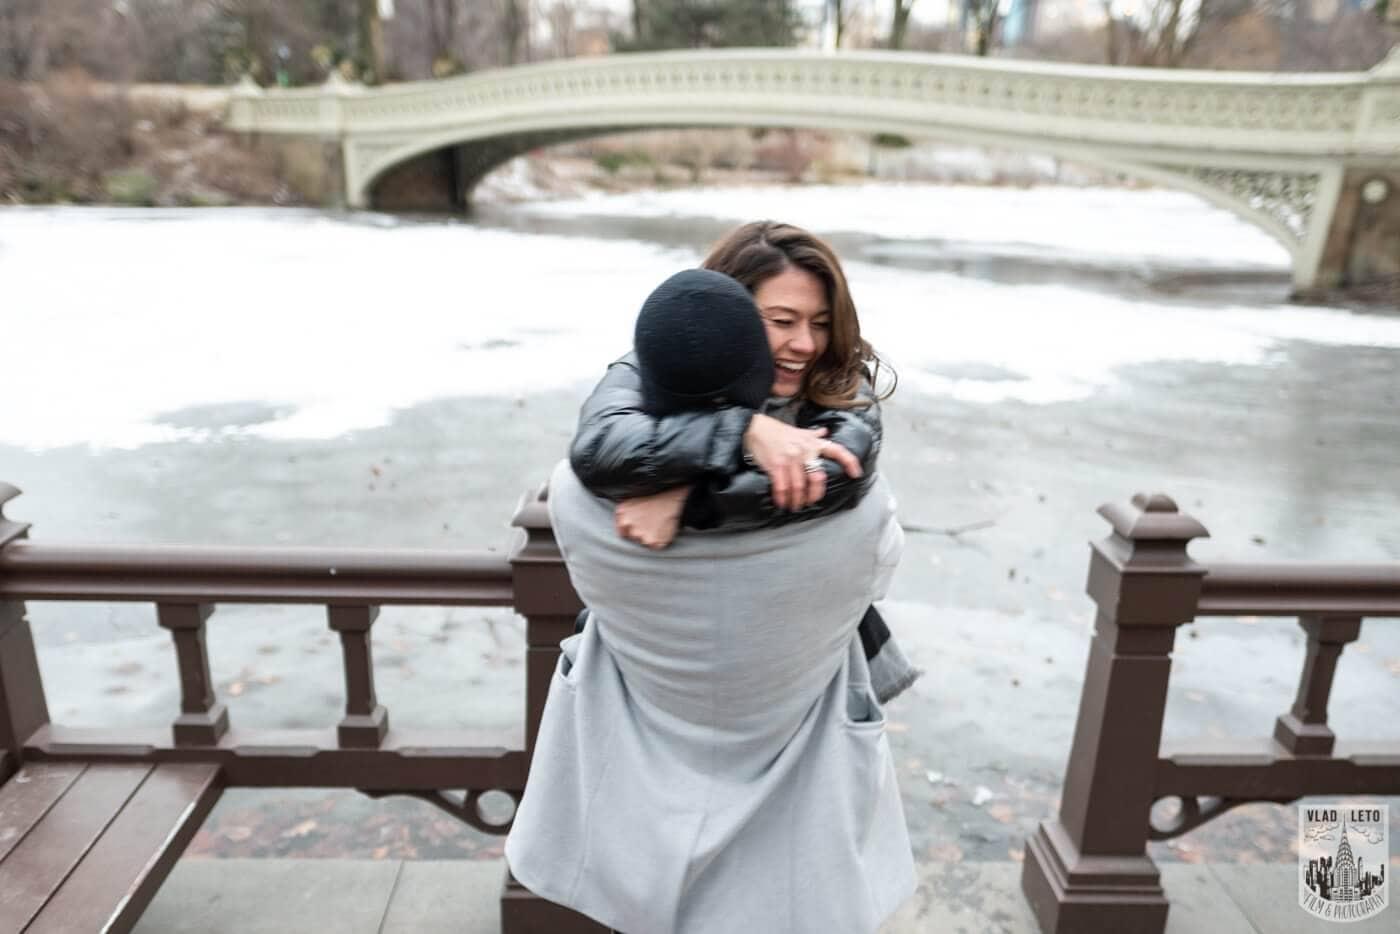 Photo 5 Bow bridge surprise marriage proposal. | VladLeto